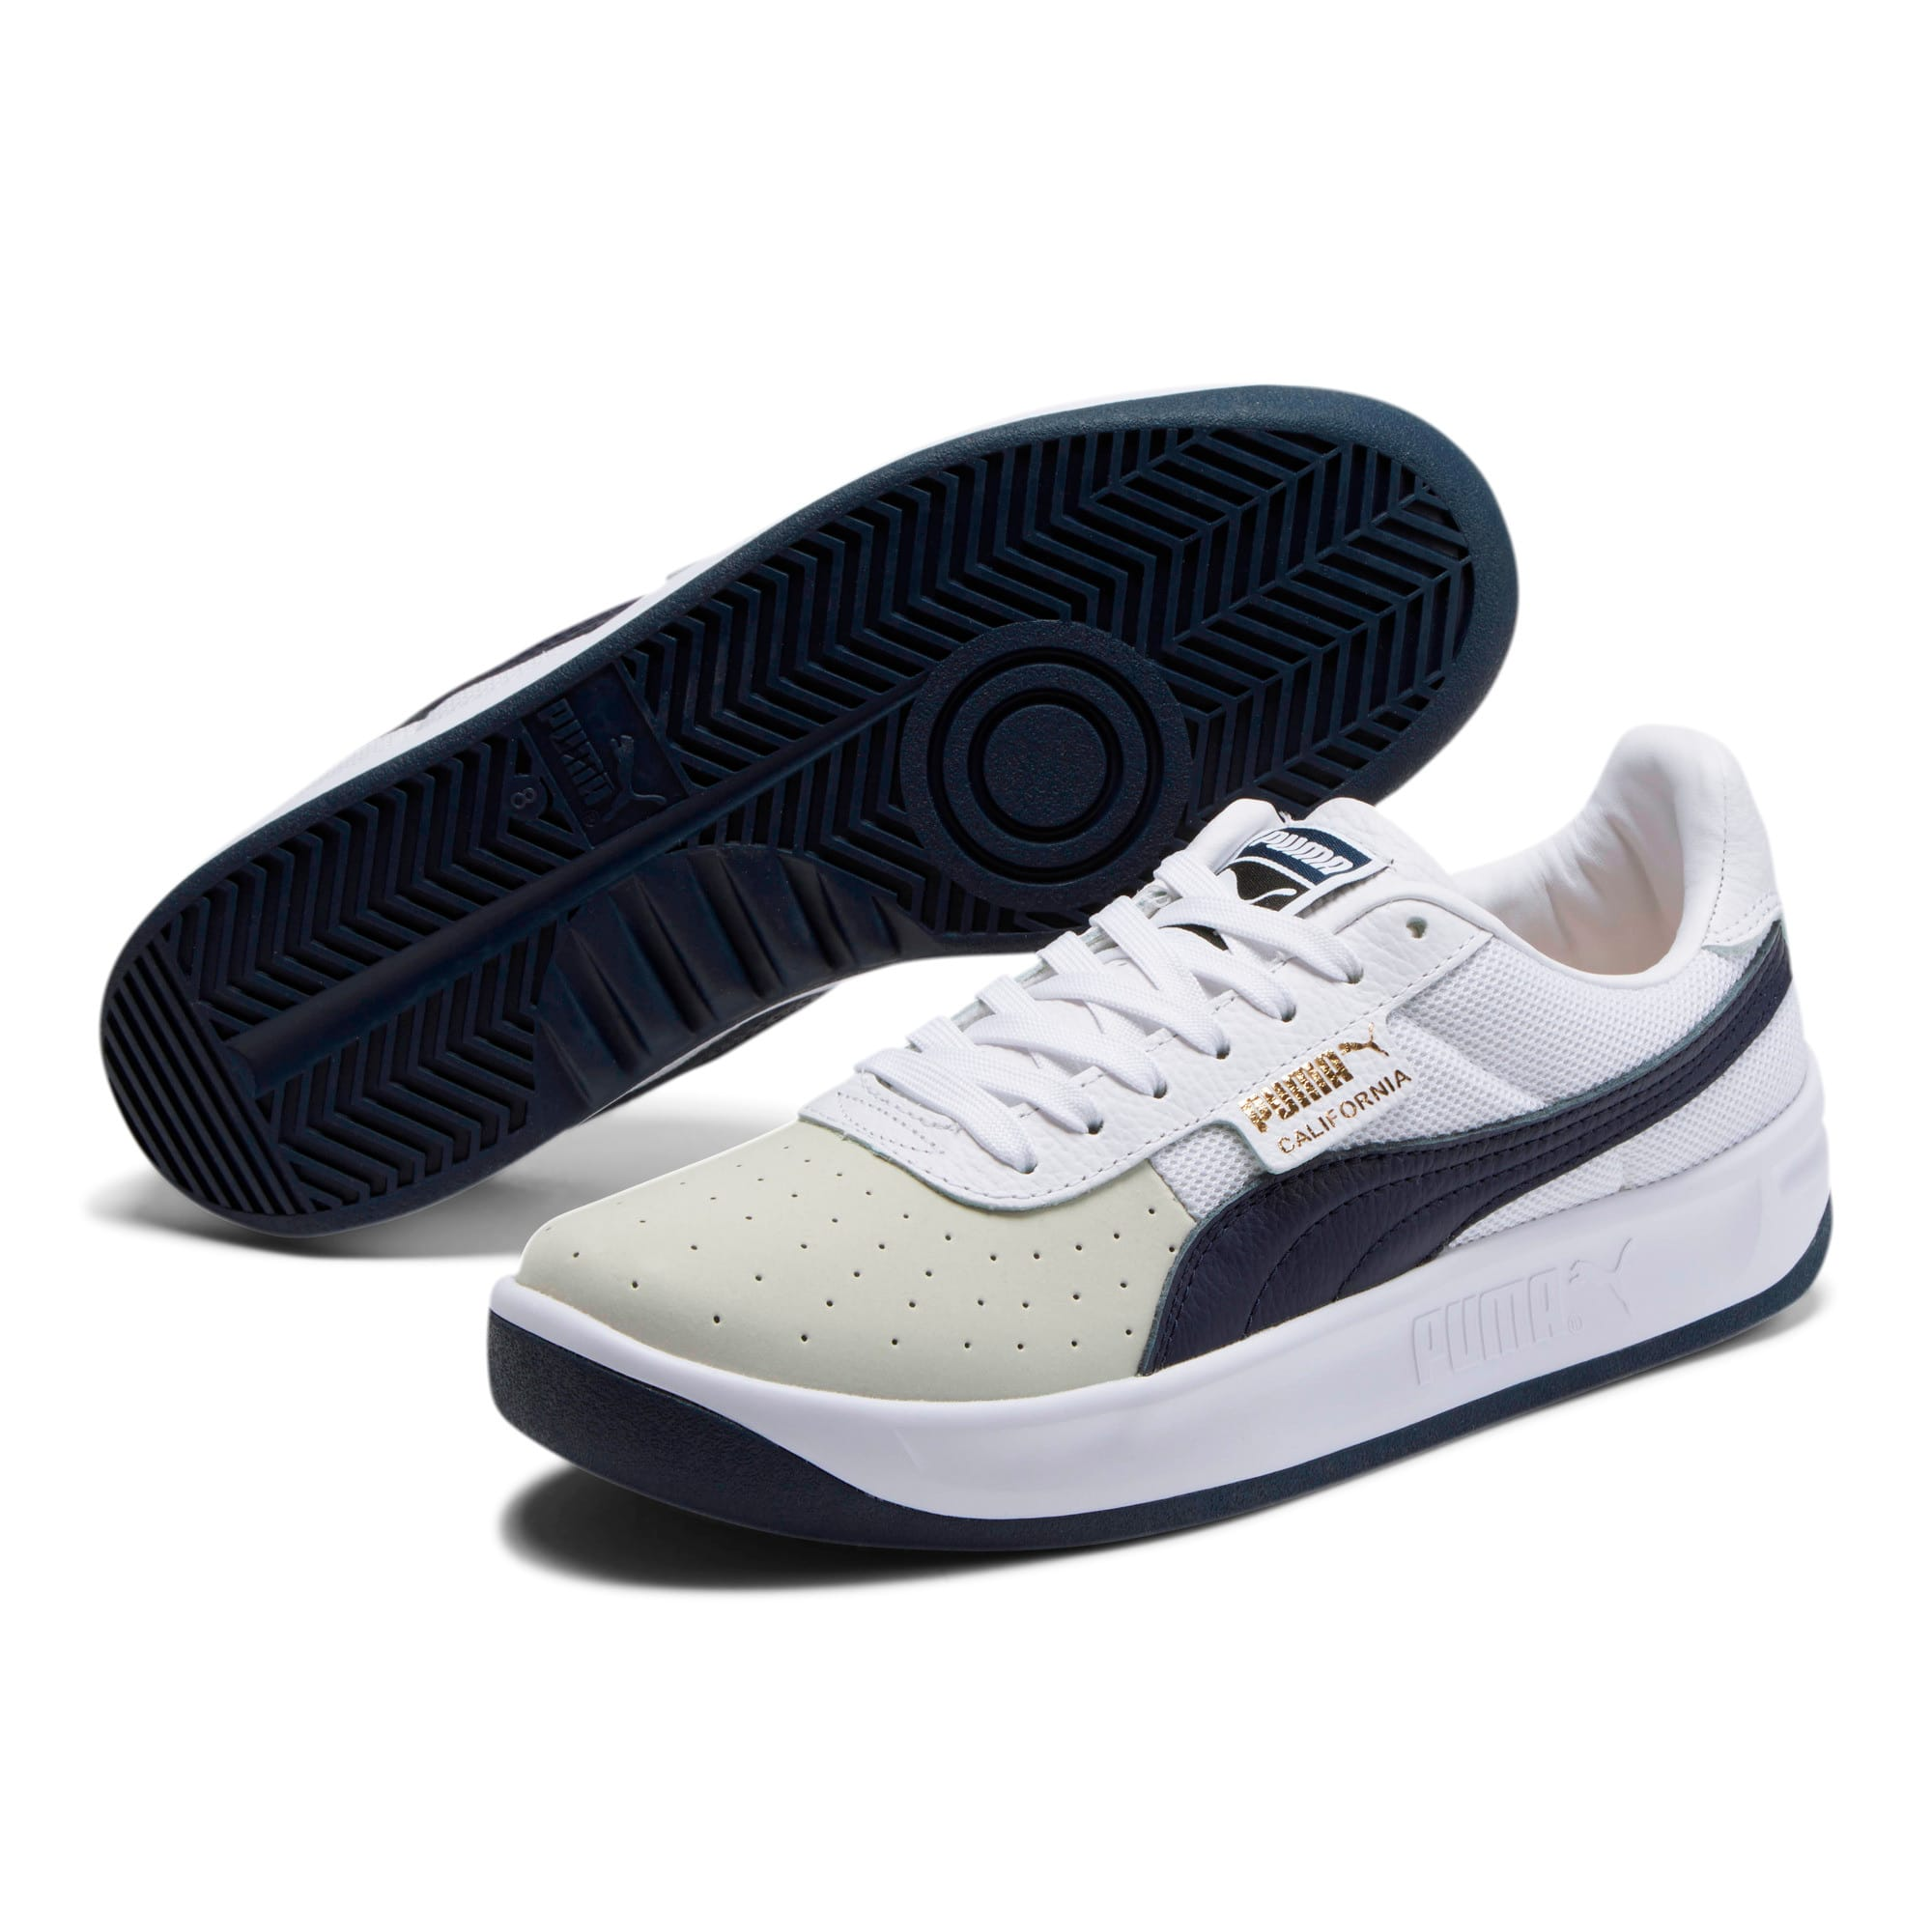 Thumbnail 2 of California Casual Sneakers, P White-Peacoat-P White, medium